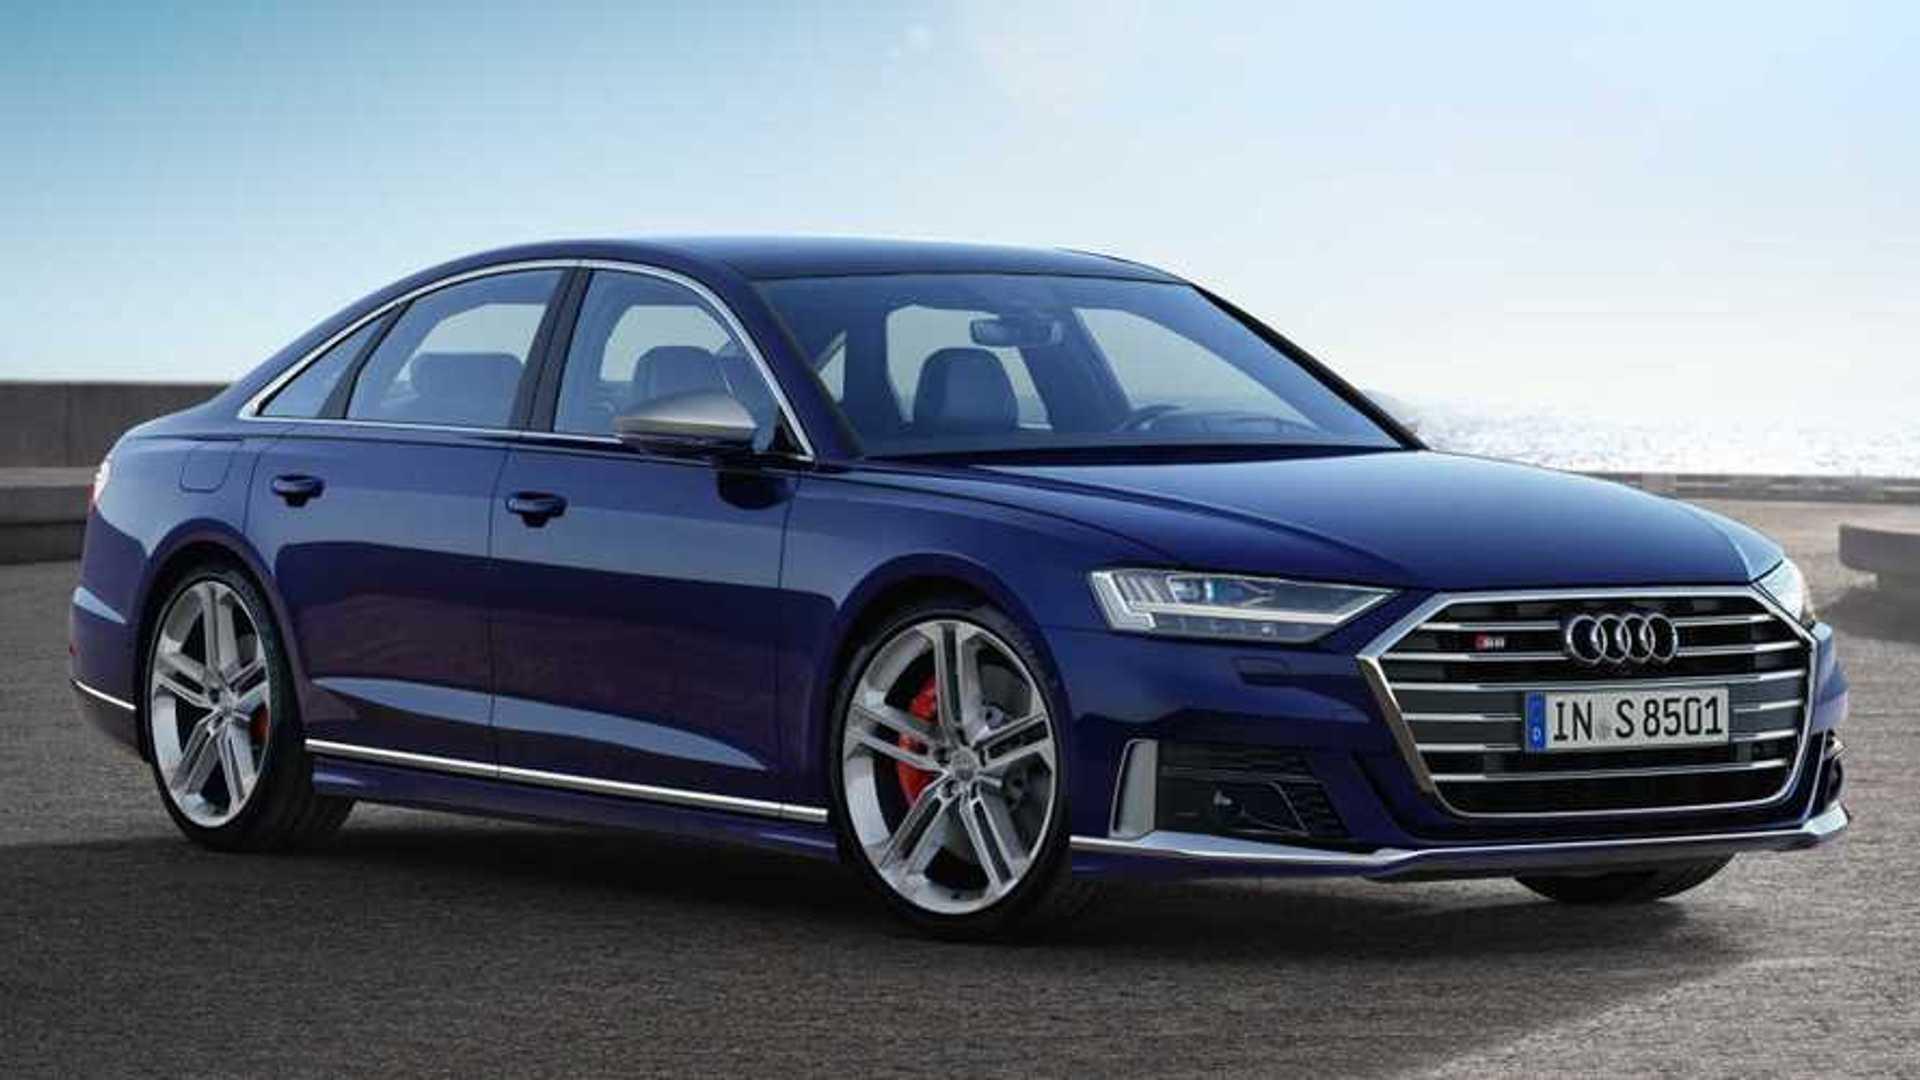 Kelebihan Audi V8 Turbo Top Model Tahun Ini